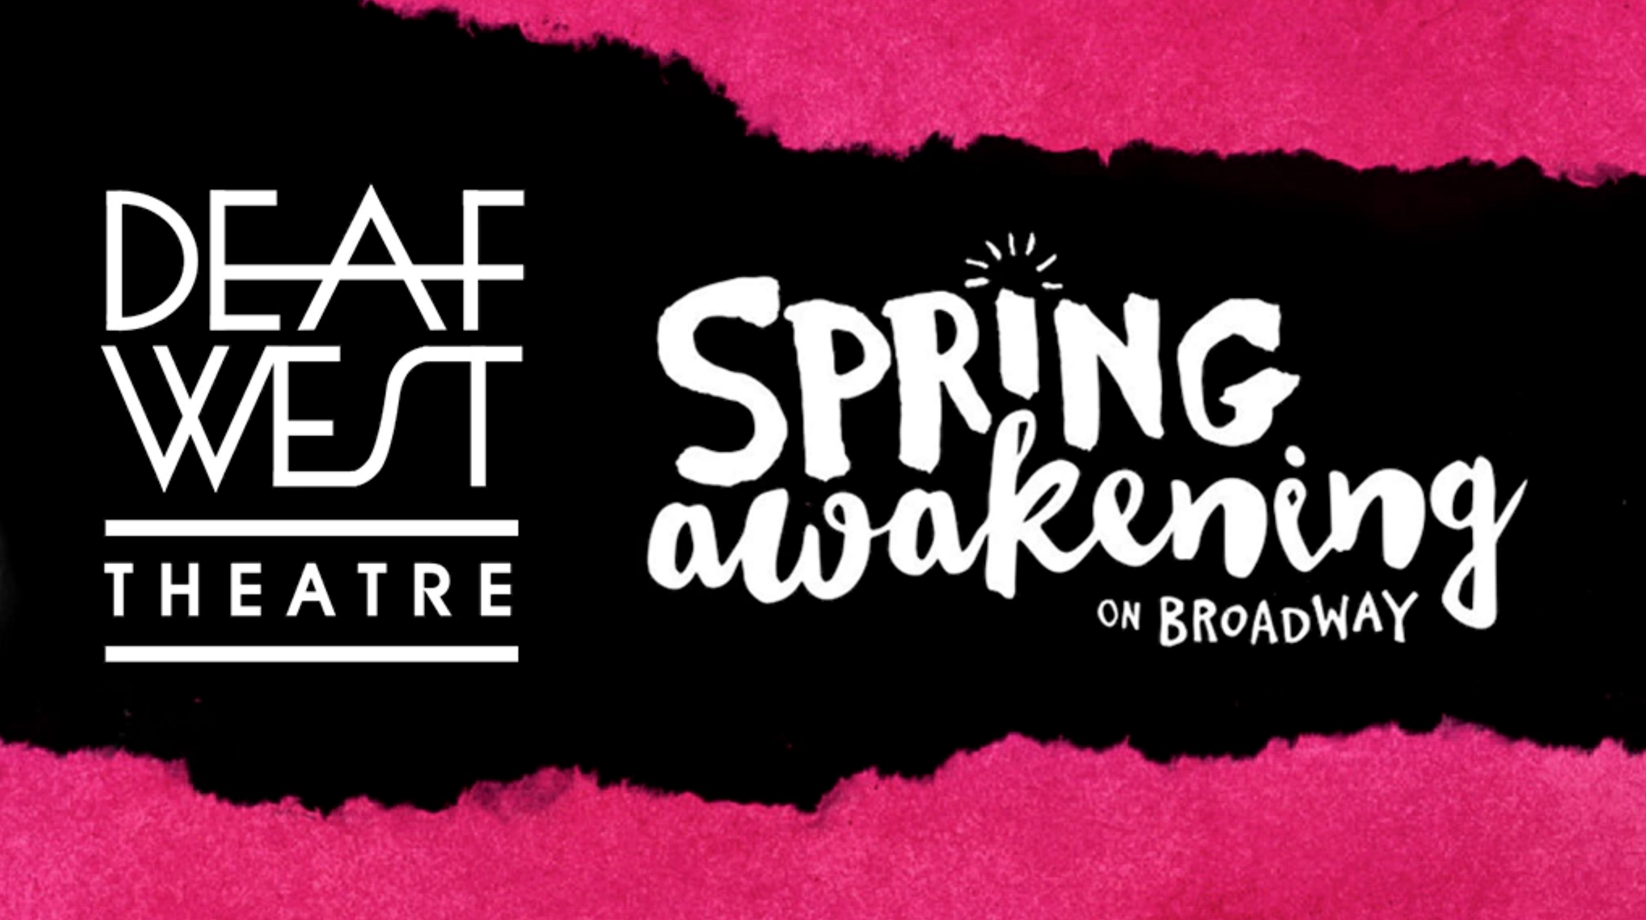 Awakening Interpretation - Broadway Sets the Stage for Linguistic Equality